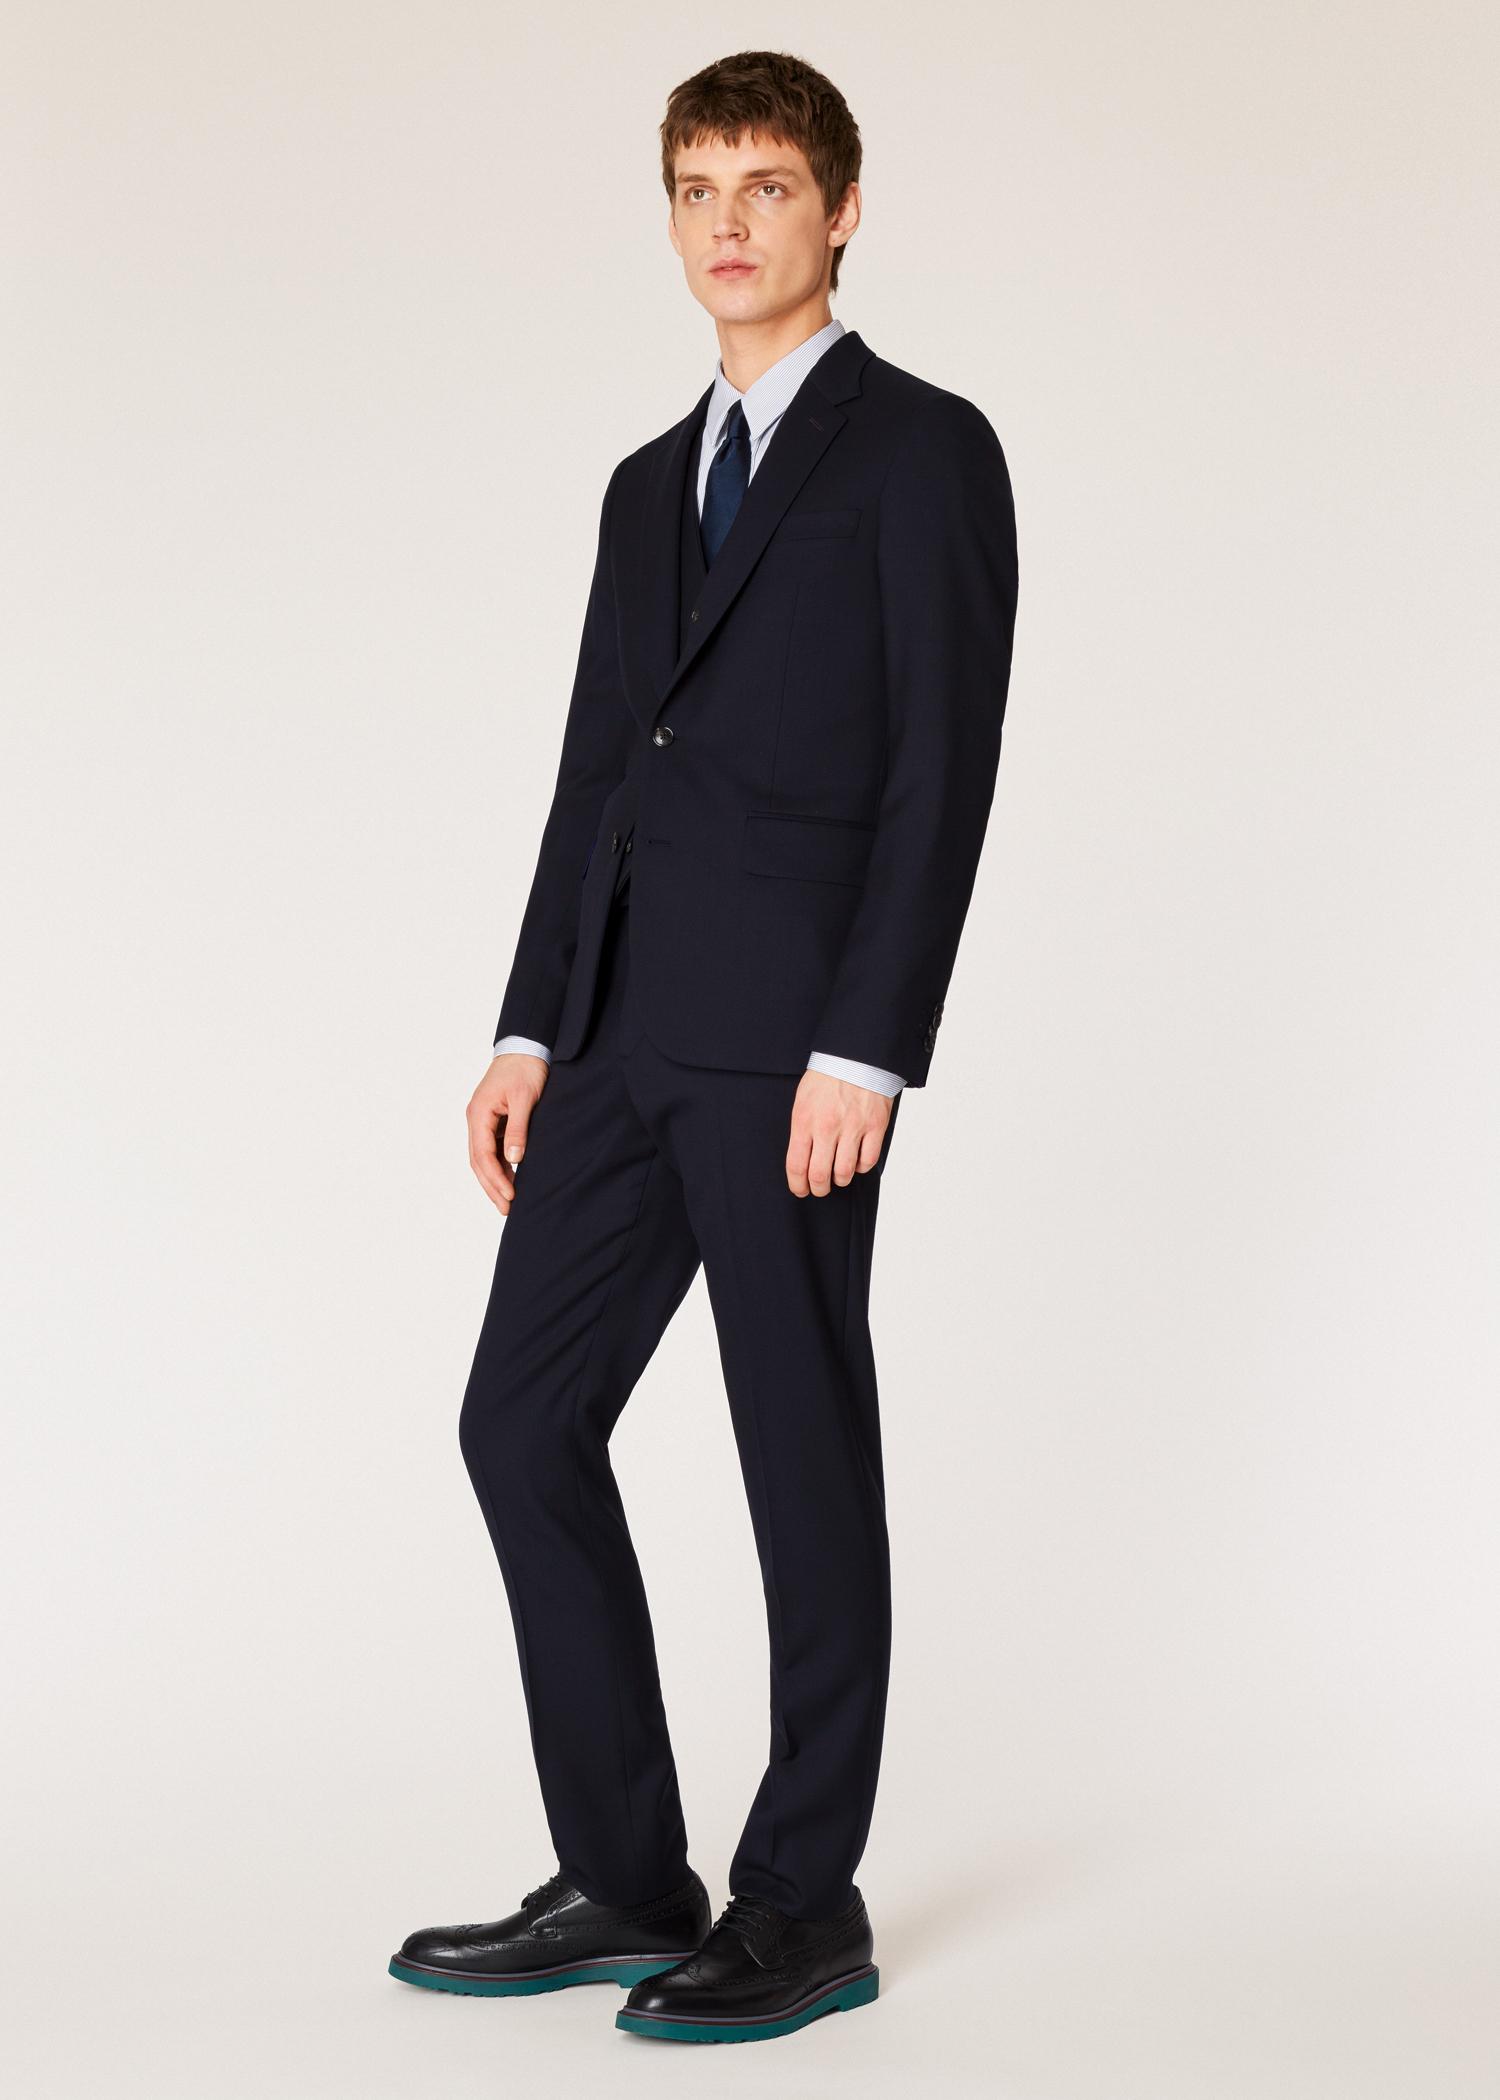 Le Soho - Costume Homme  A Suit To Travel In  Bleu Marine En Laine ... 2eedf9edff3